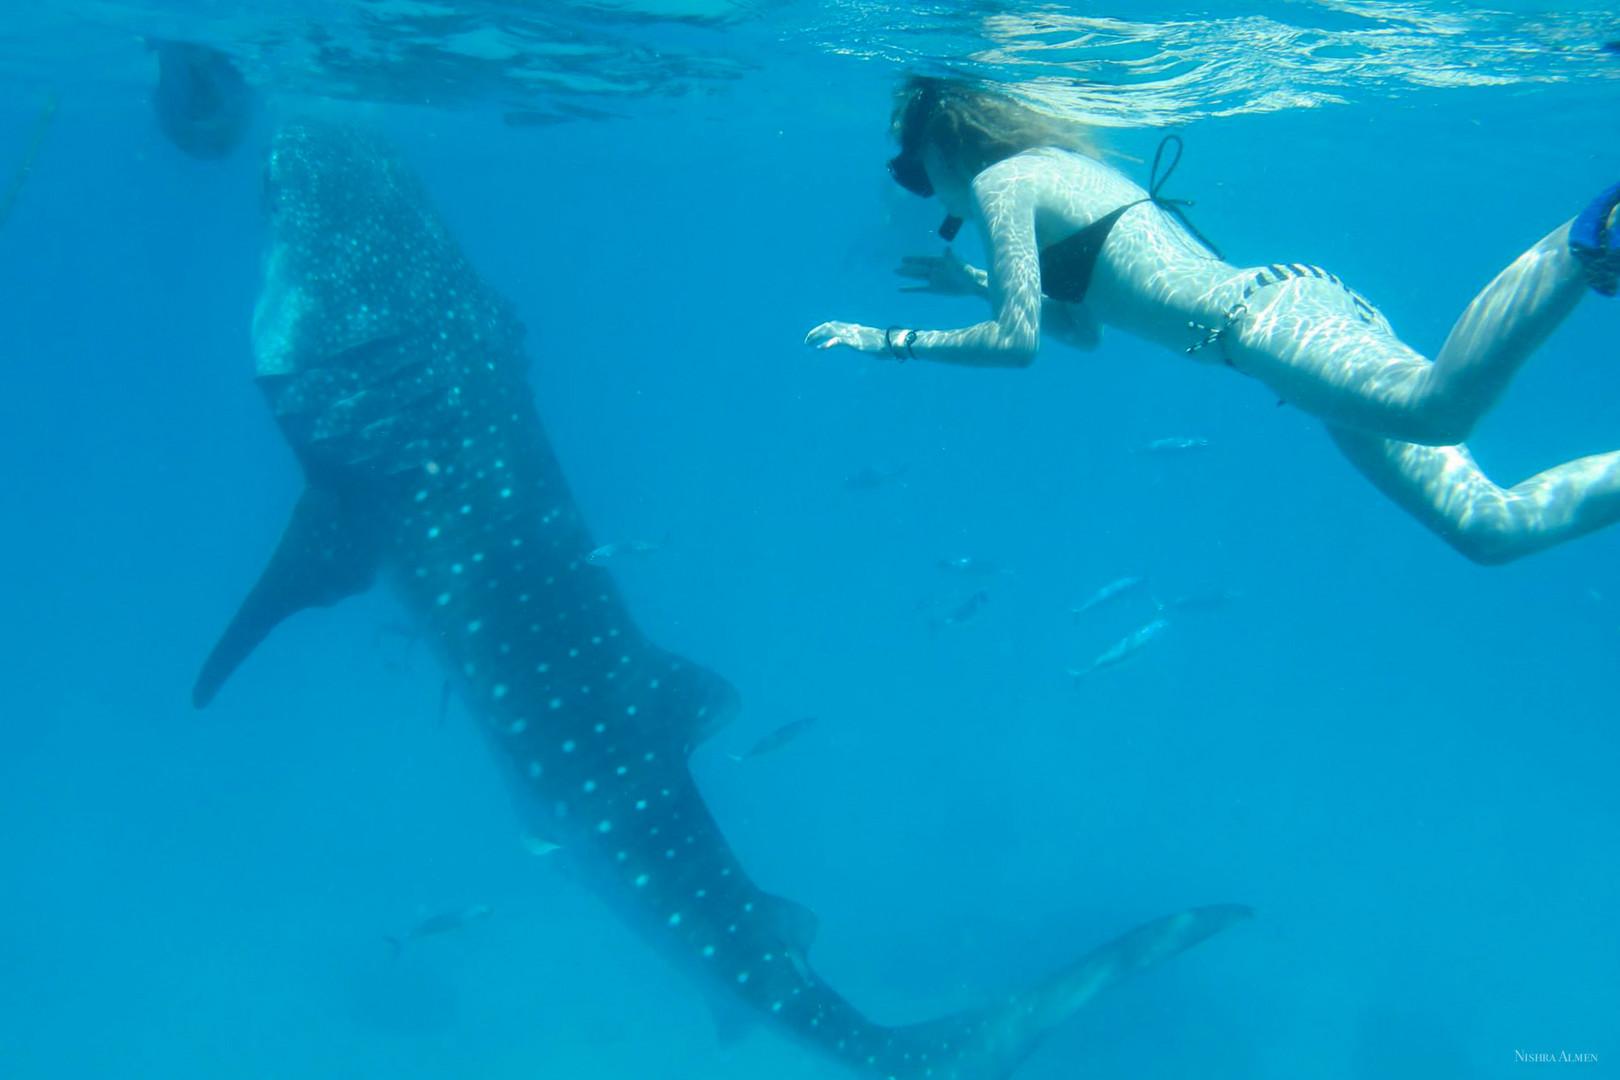 Pleione whaleshark